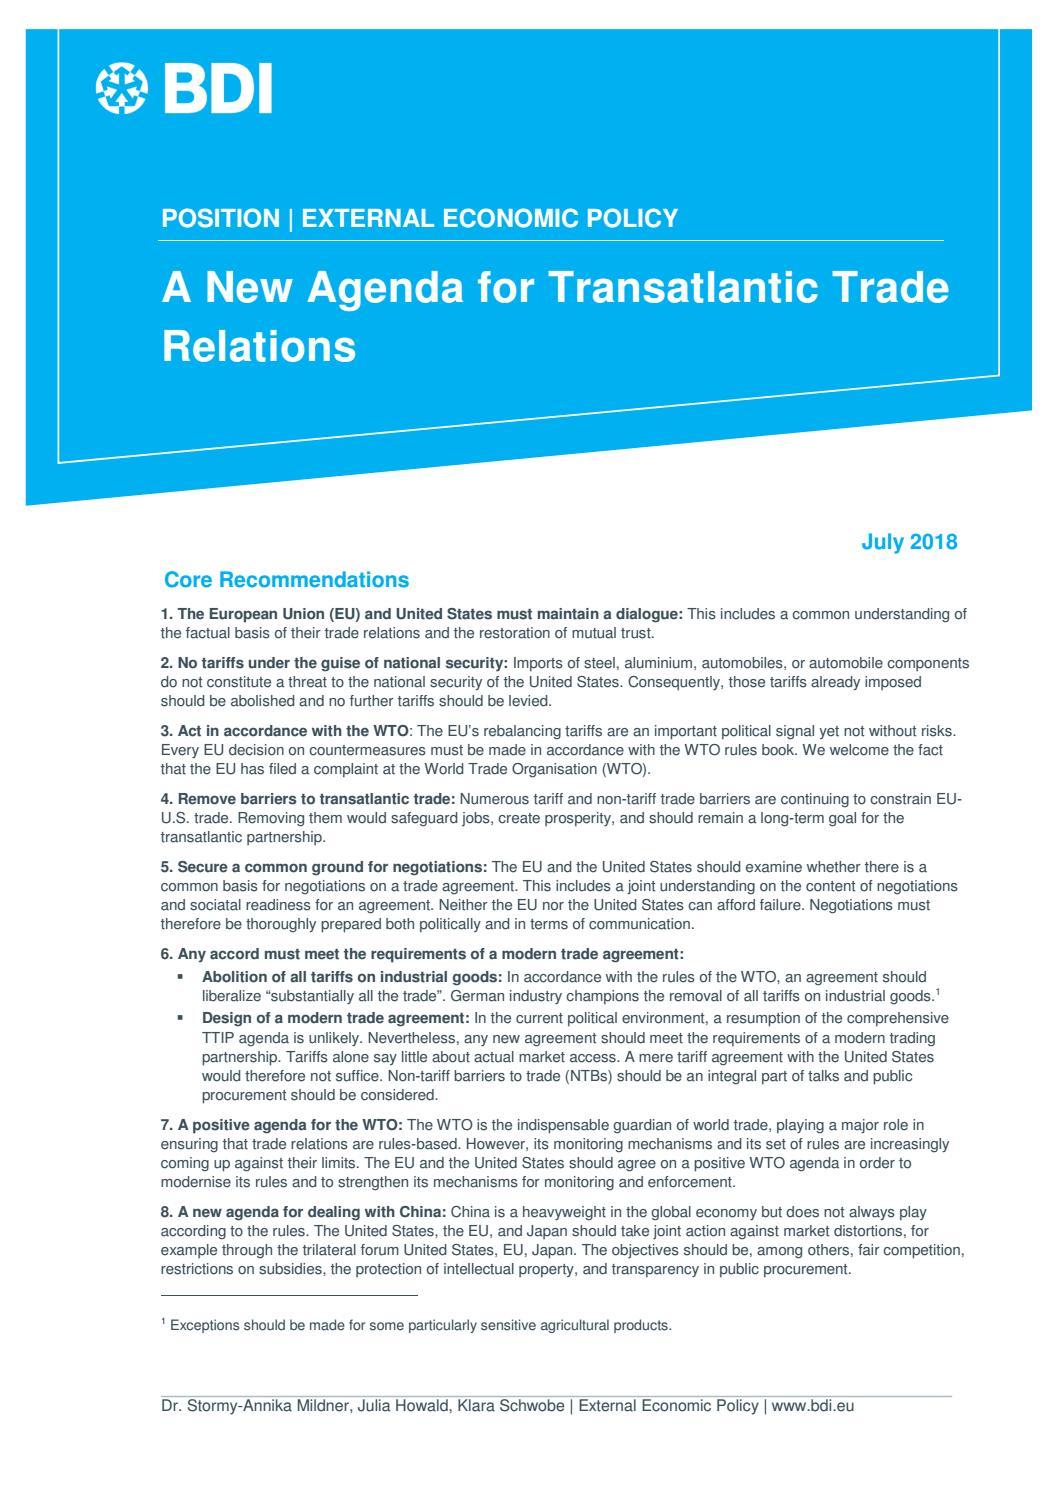 A New Agenda For Transatlantic Trade Telations By Bundesverband Der